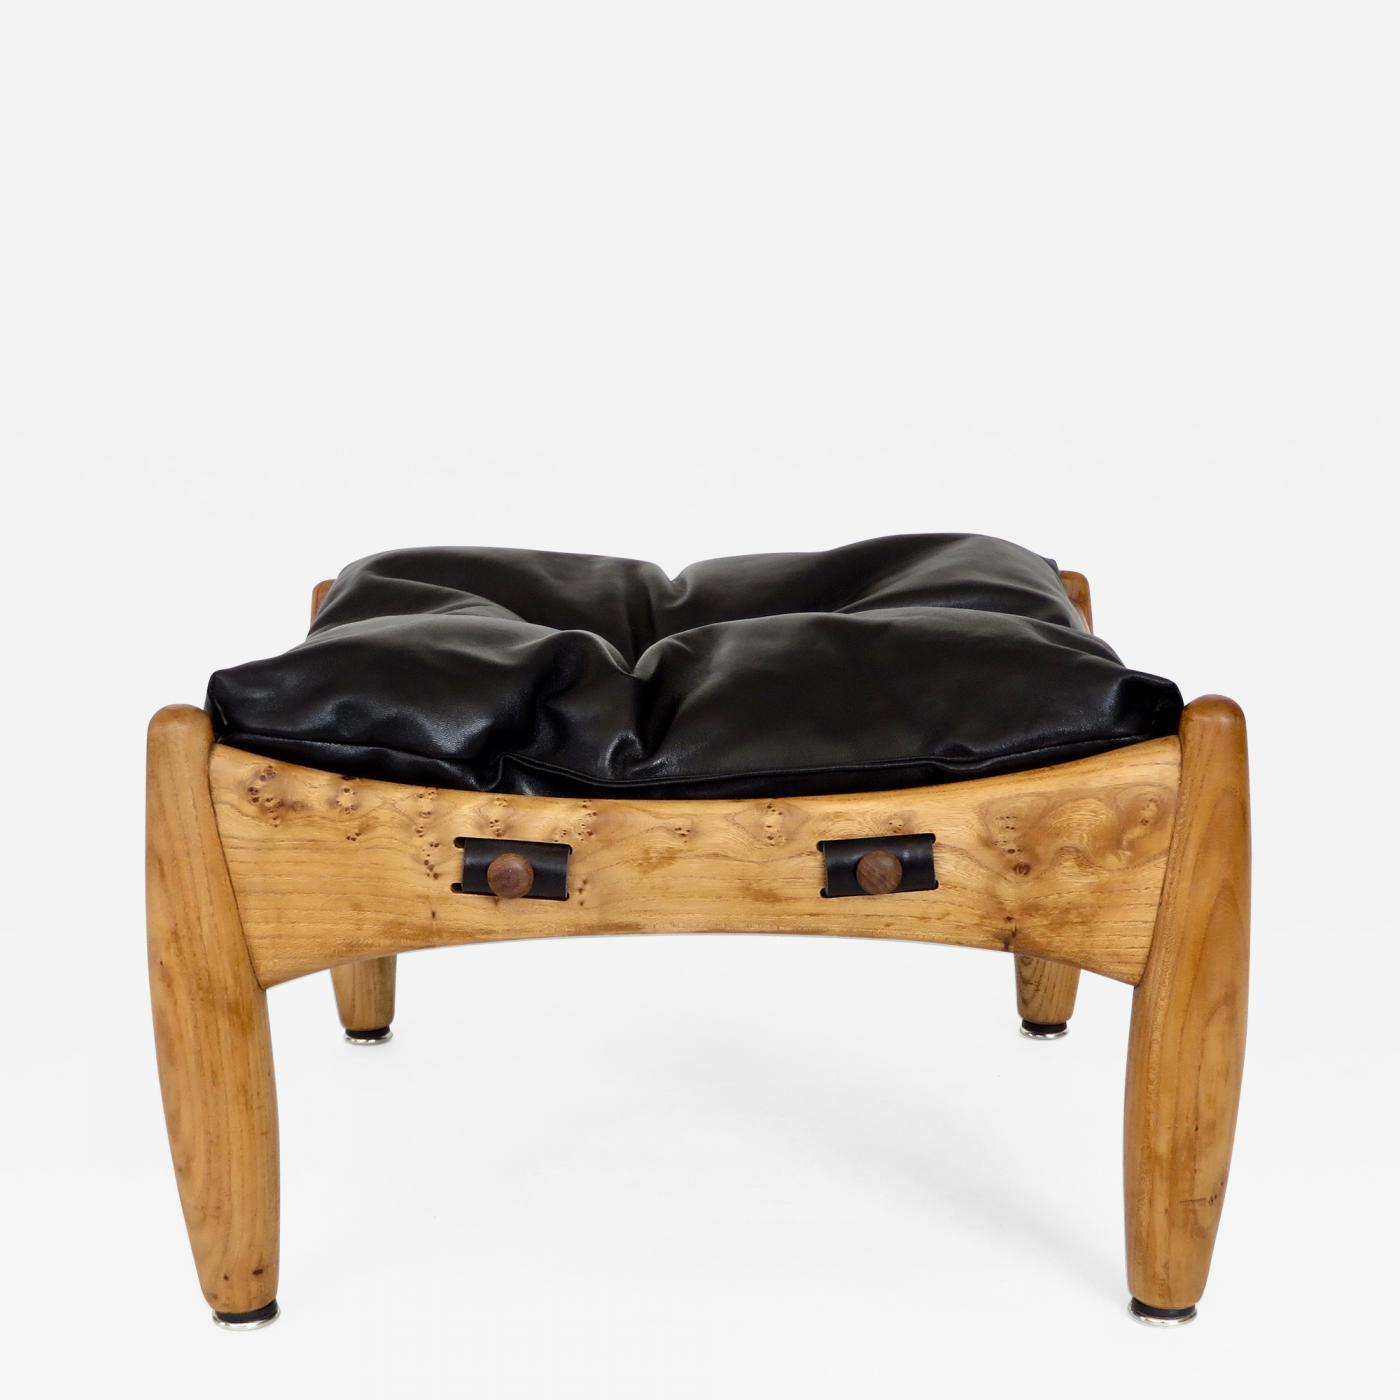 sergio rodrigues sergio rodrigues brazilian design sherrif ottoman or footstool by isa bergamo